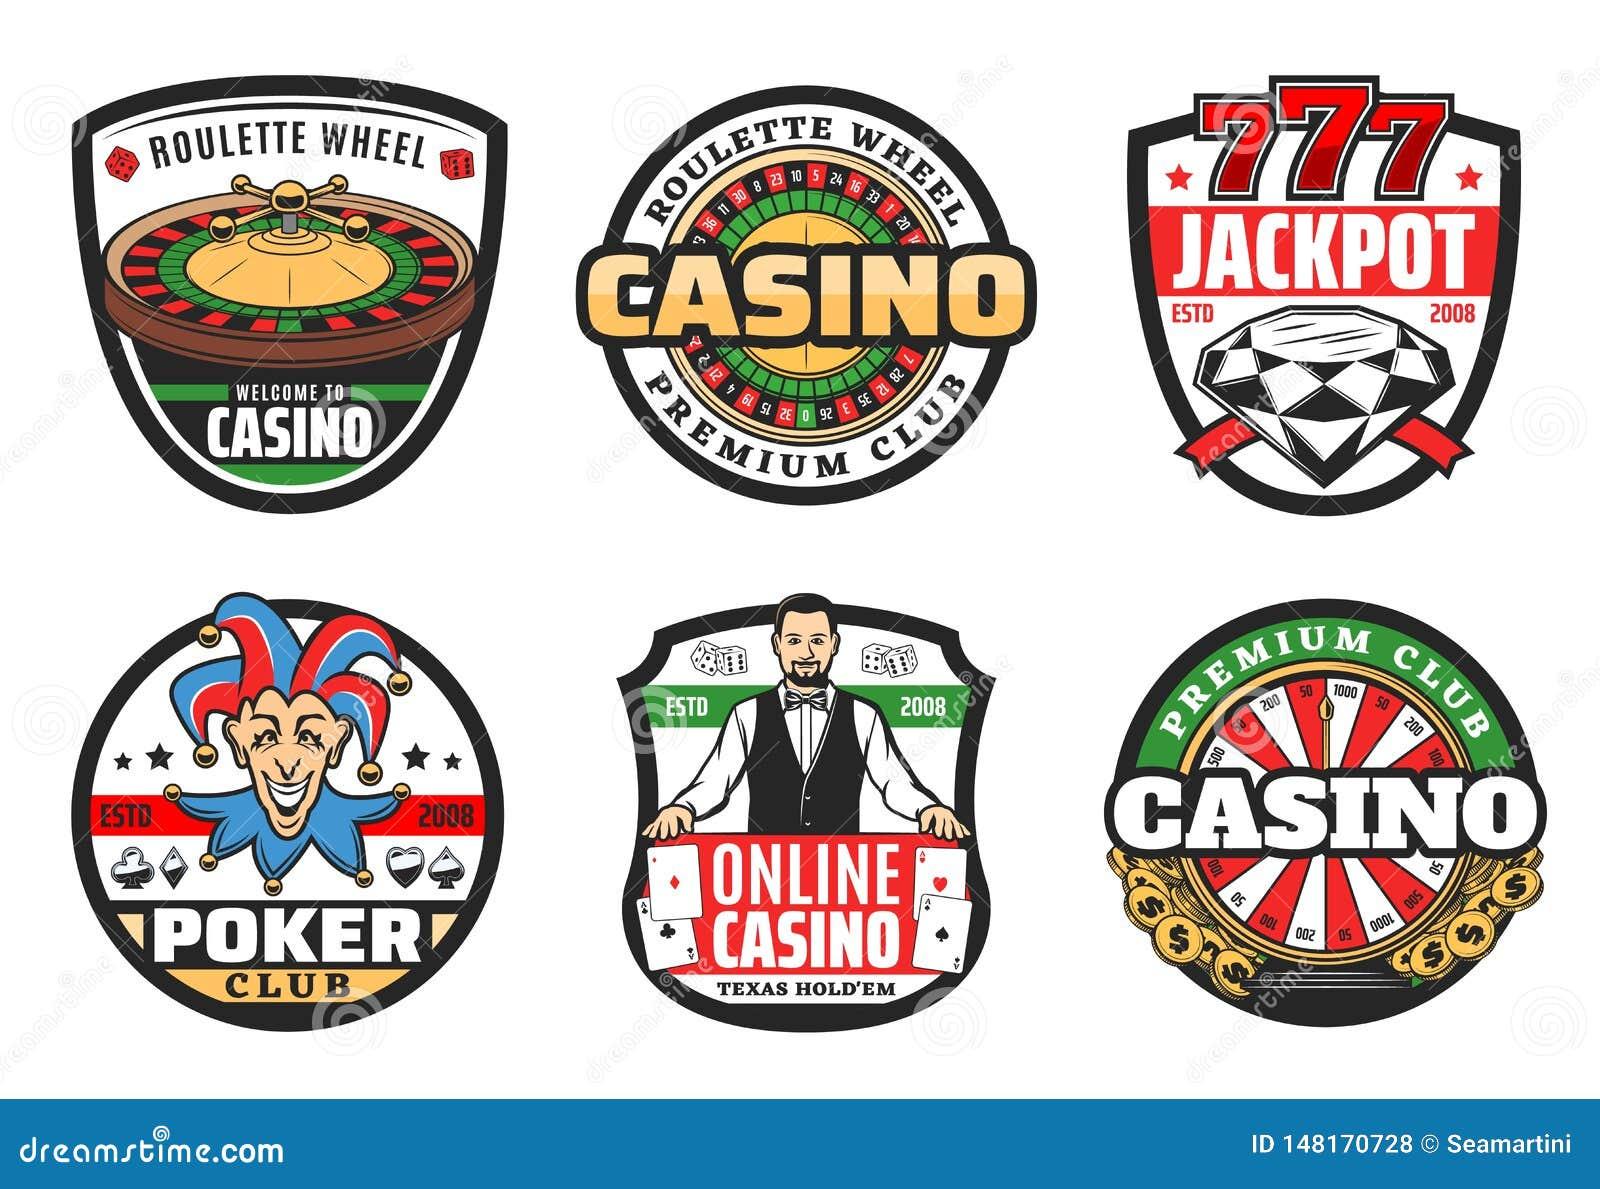 Casino poker club sign, premium jackpot gambling